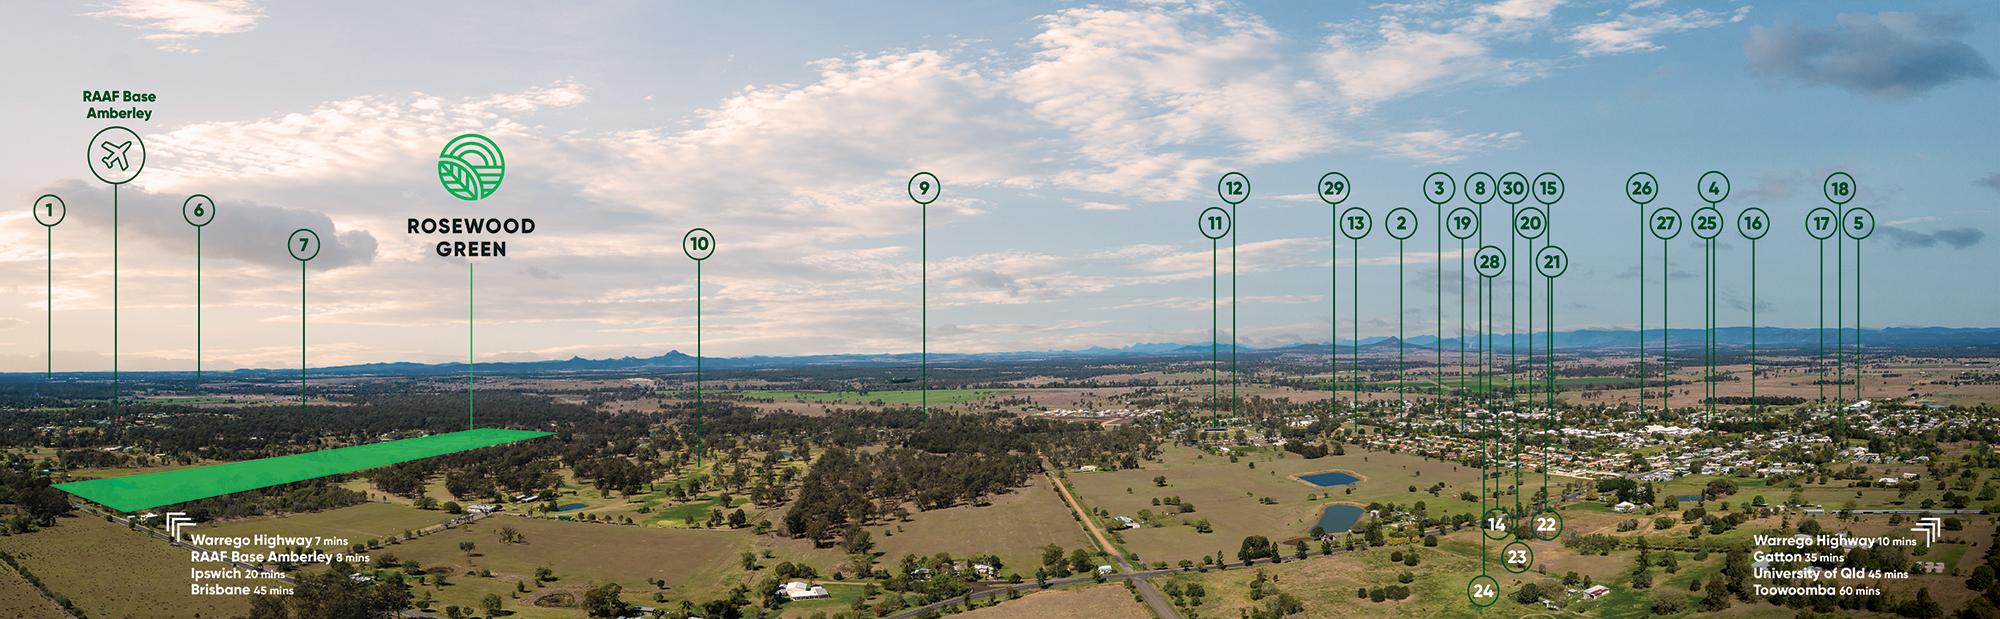 RGP23300 Rosewood Green Aerial Maps v8-01.jpg